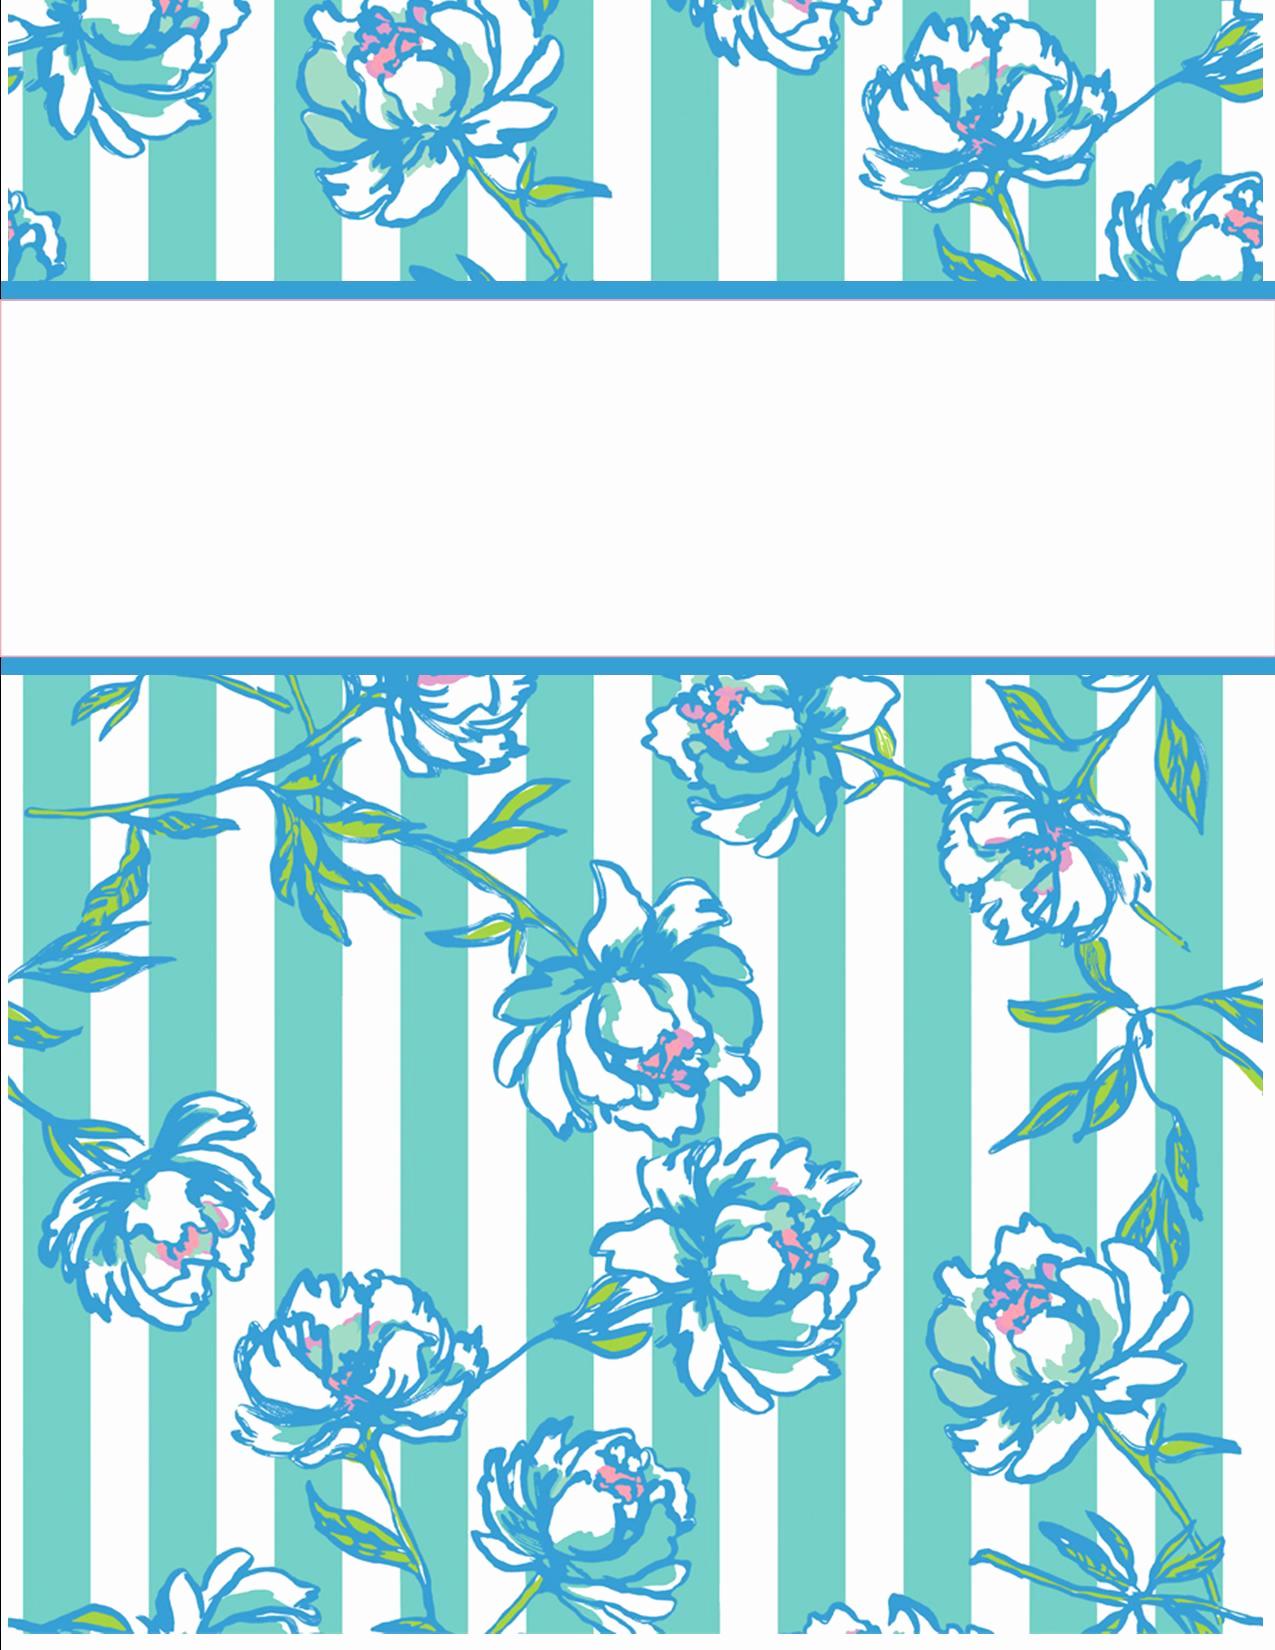 Free Binder Cover Templates Beautiful My Cute Binder Covers